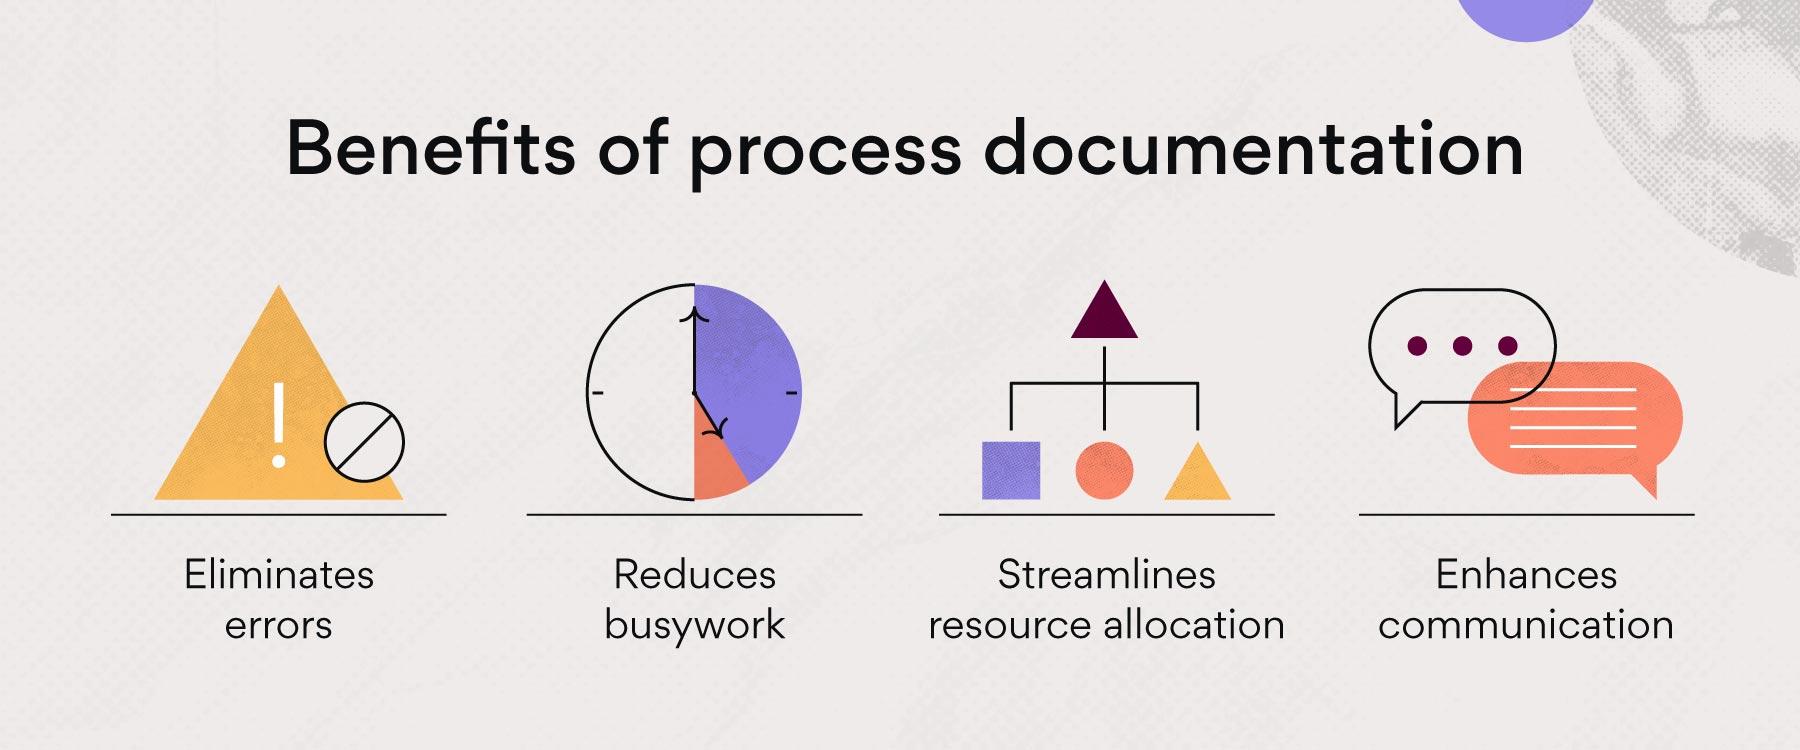 Benefits of process documentation